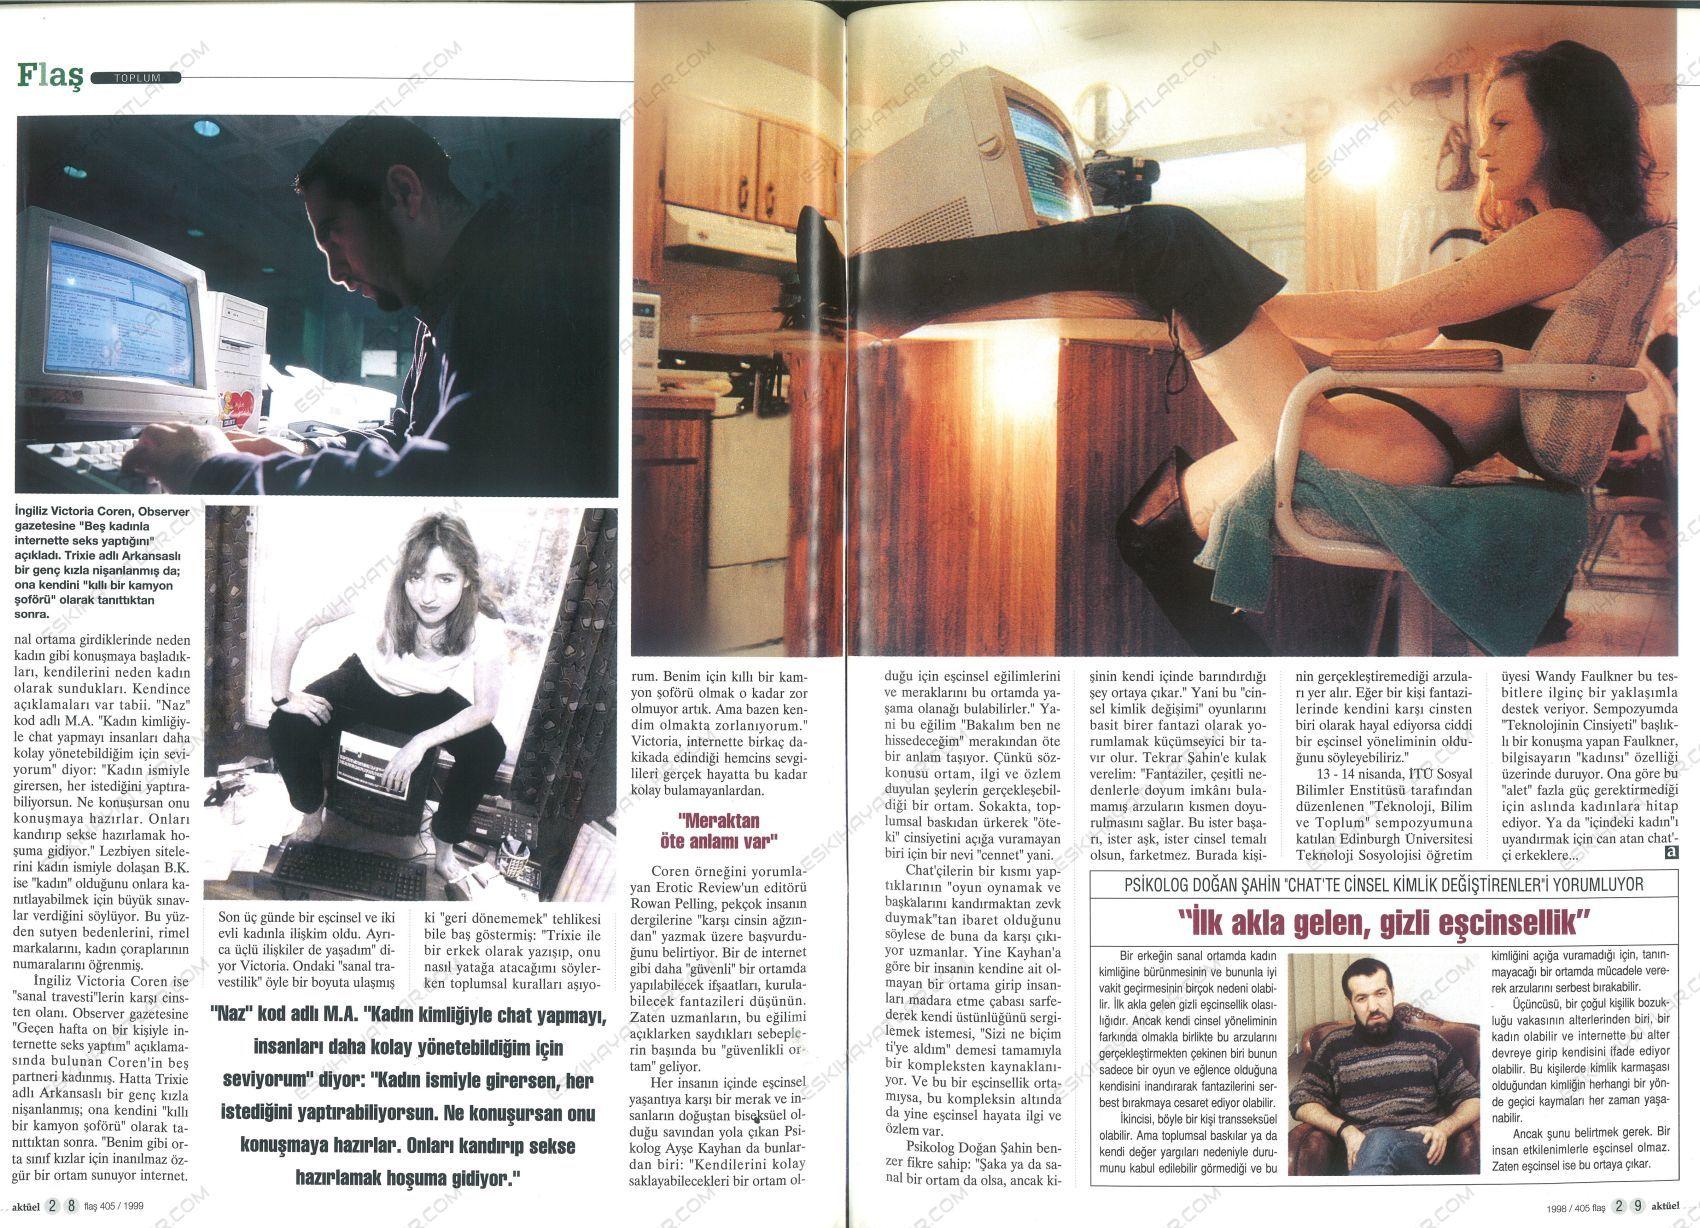 0340-internet-chat-odalari-mIRC-zurna-kanali-travestiler-1999-aktuel-dergisi (1)